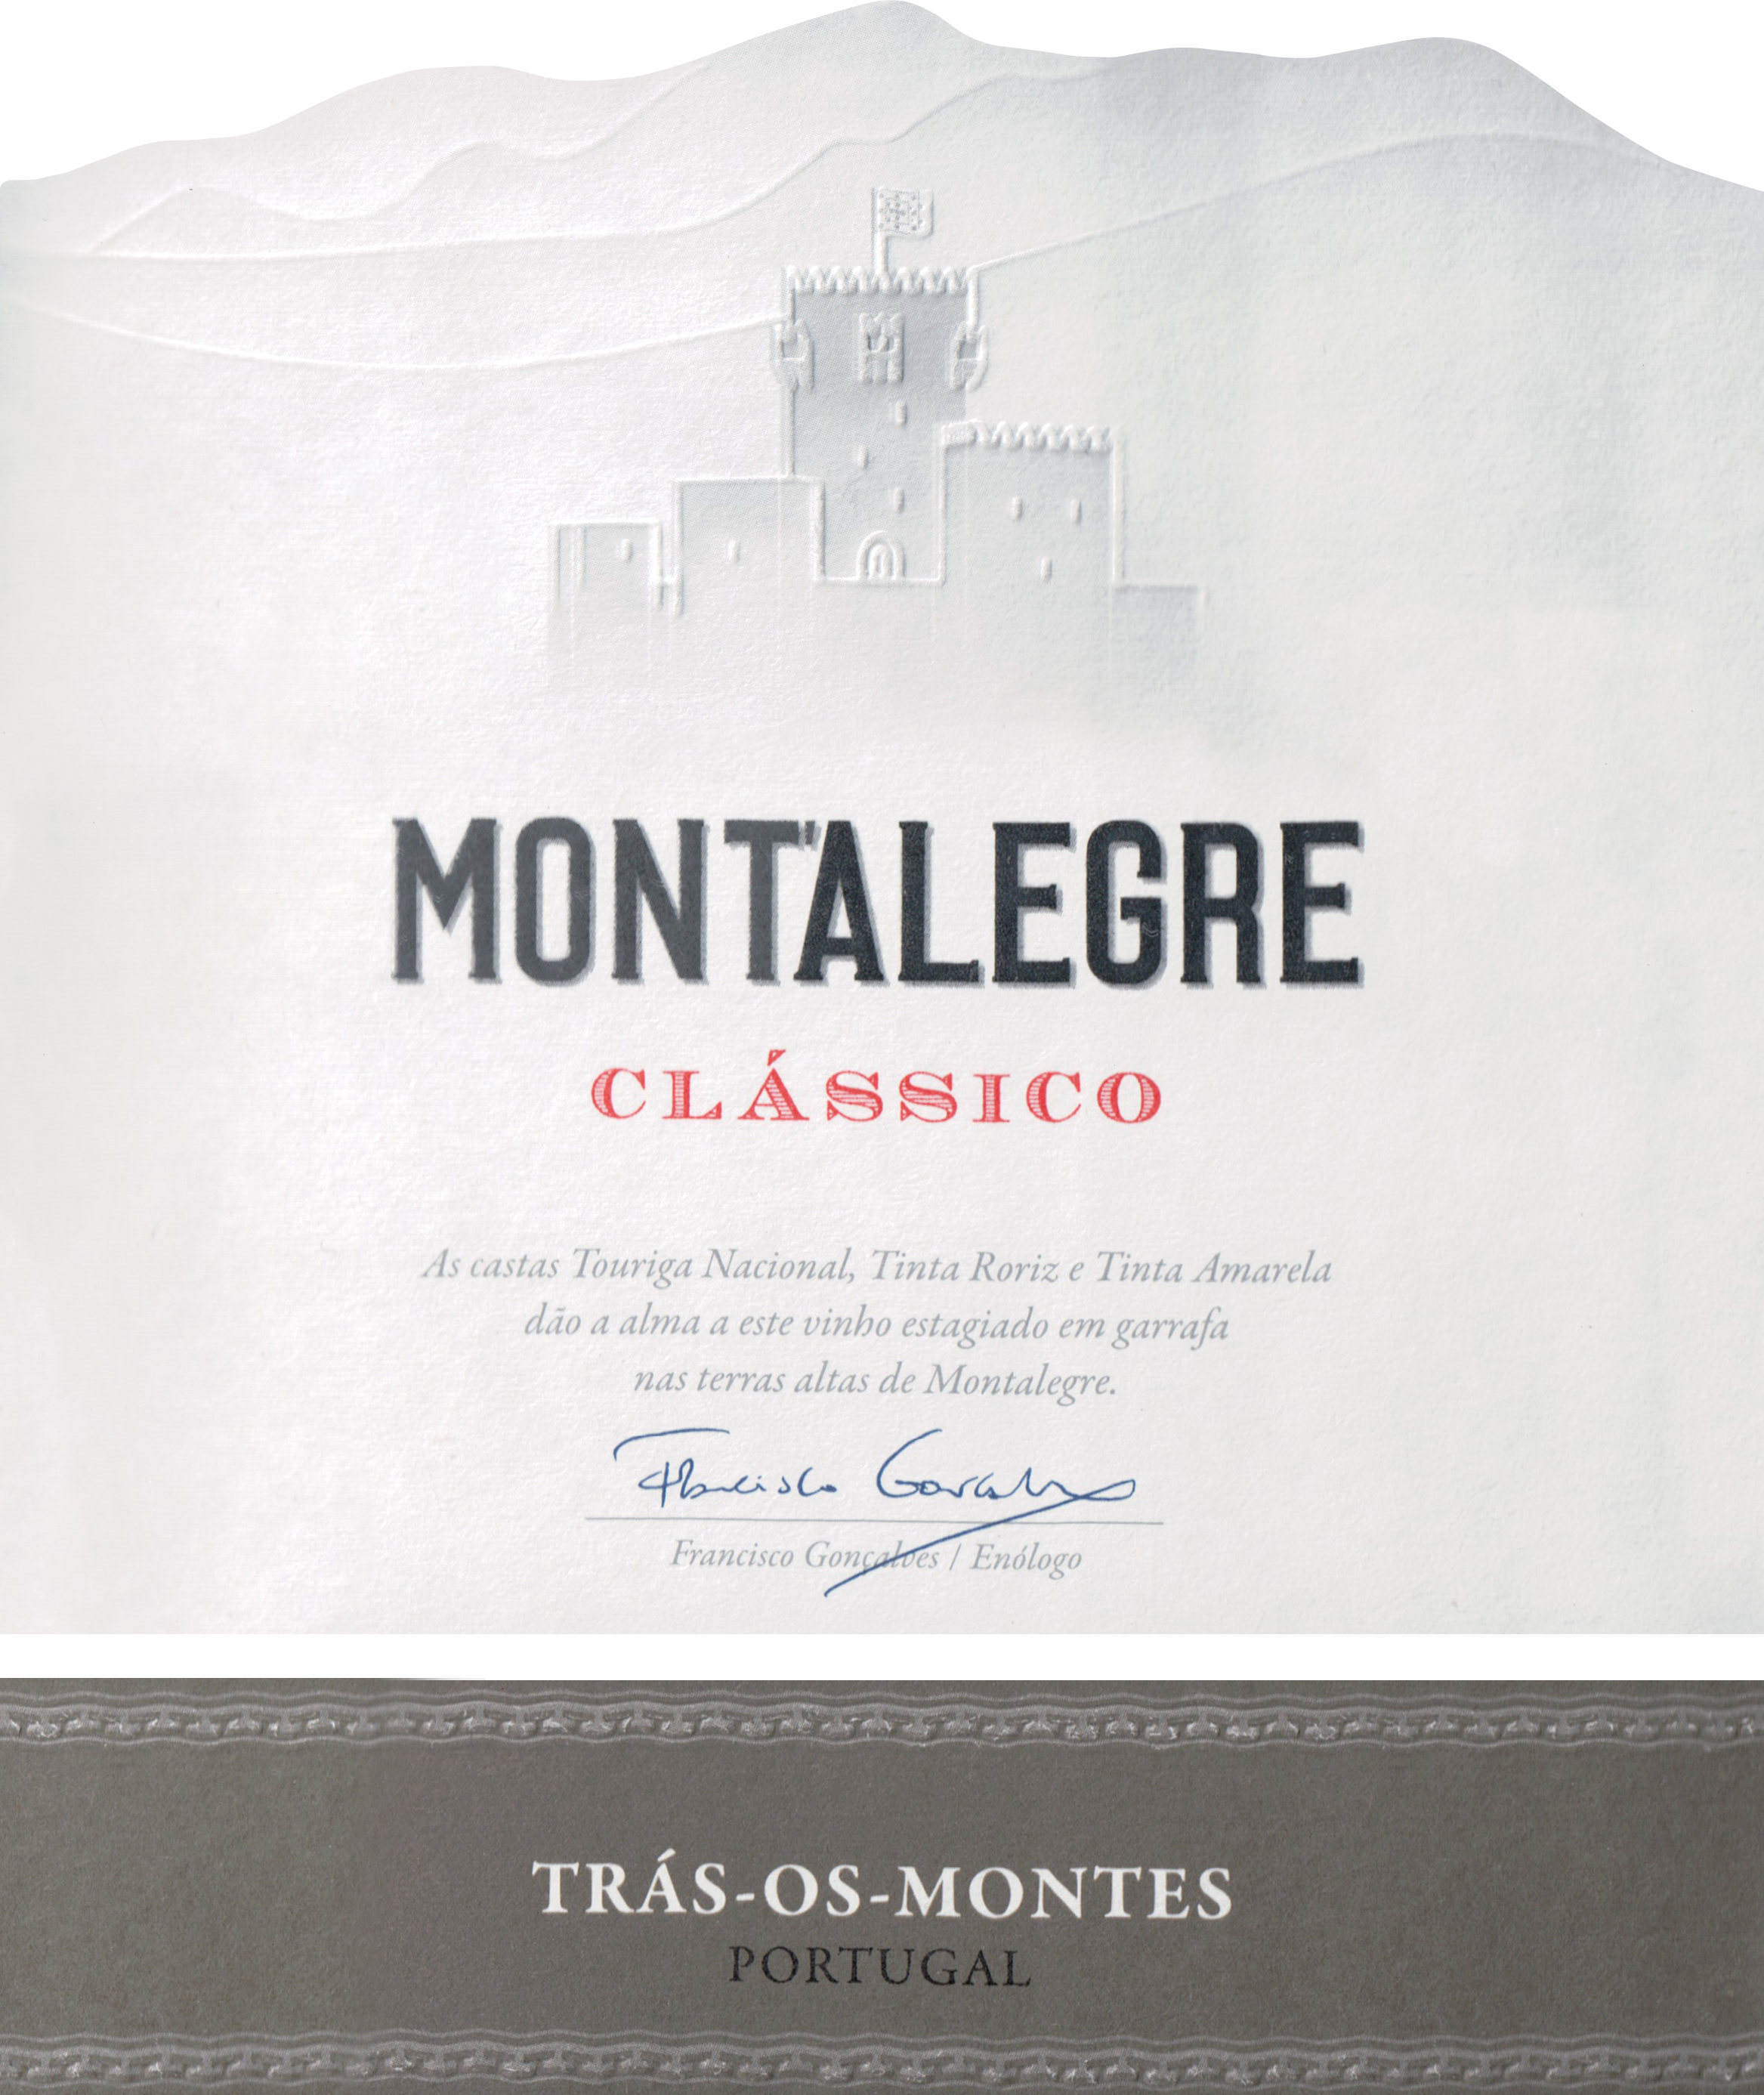 Montalegre Classico Tinto 2016